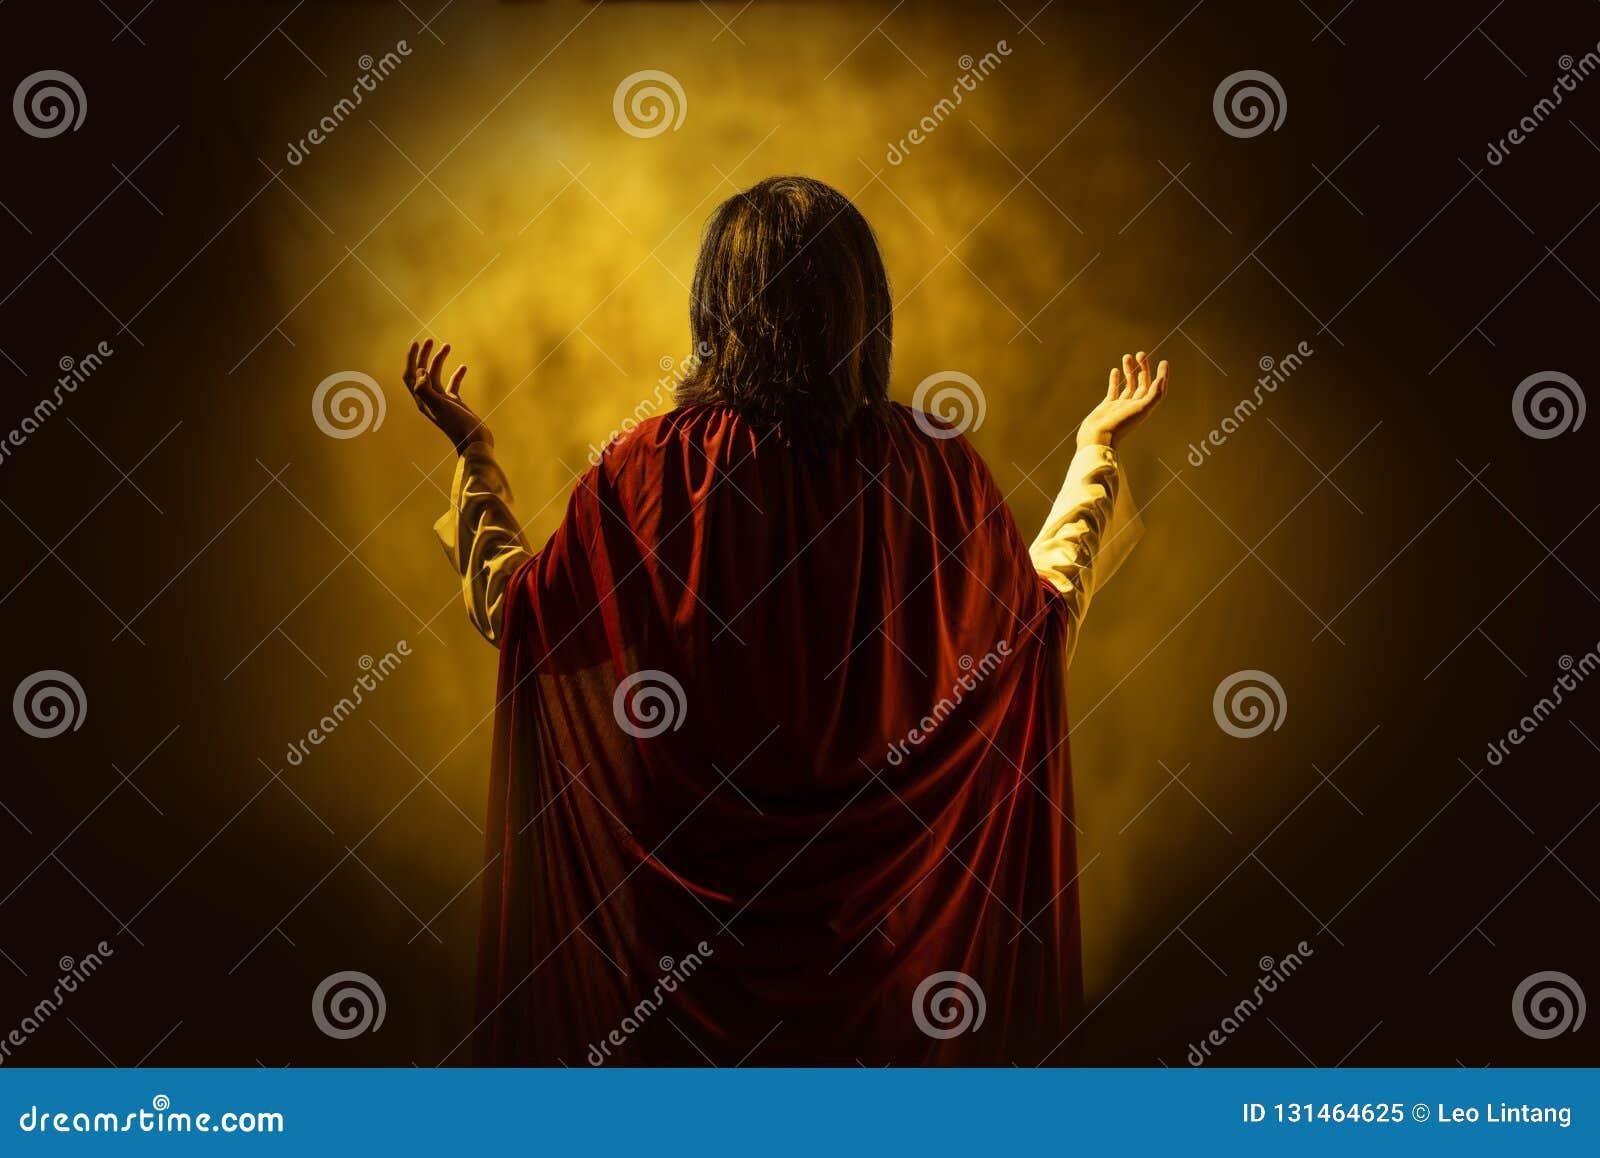 Rear view of Jesus christ praying to god